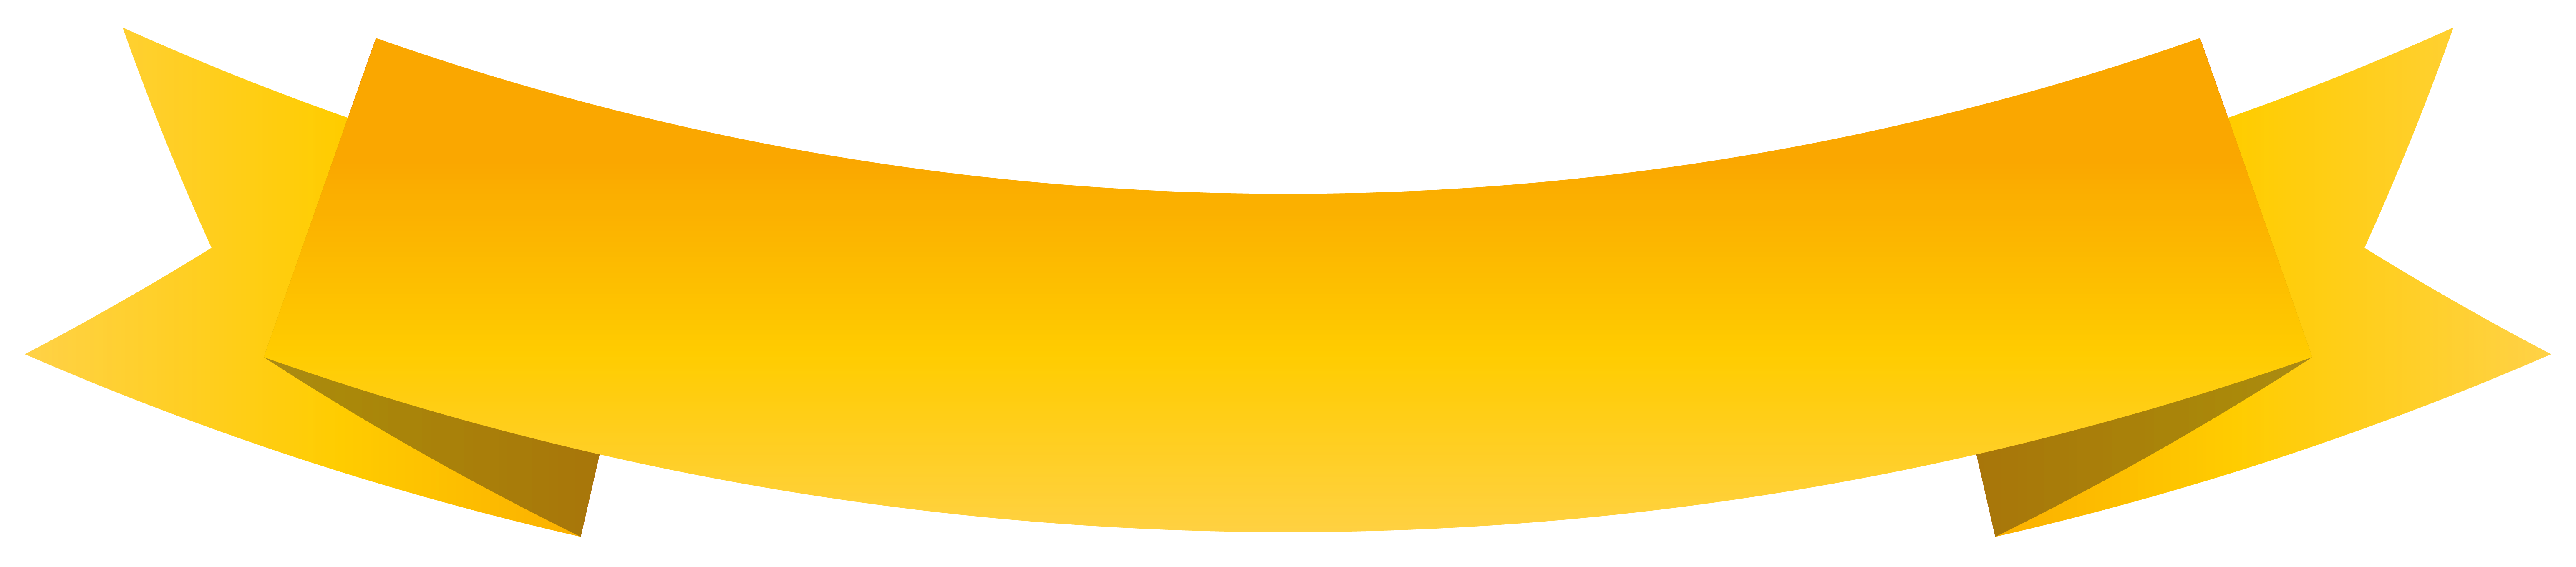 Ribbon Clipart Yellow.